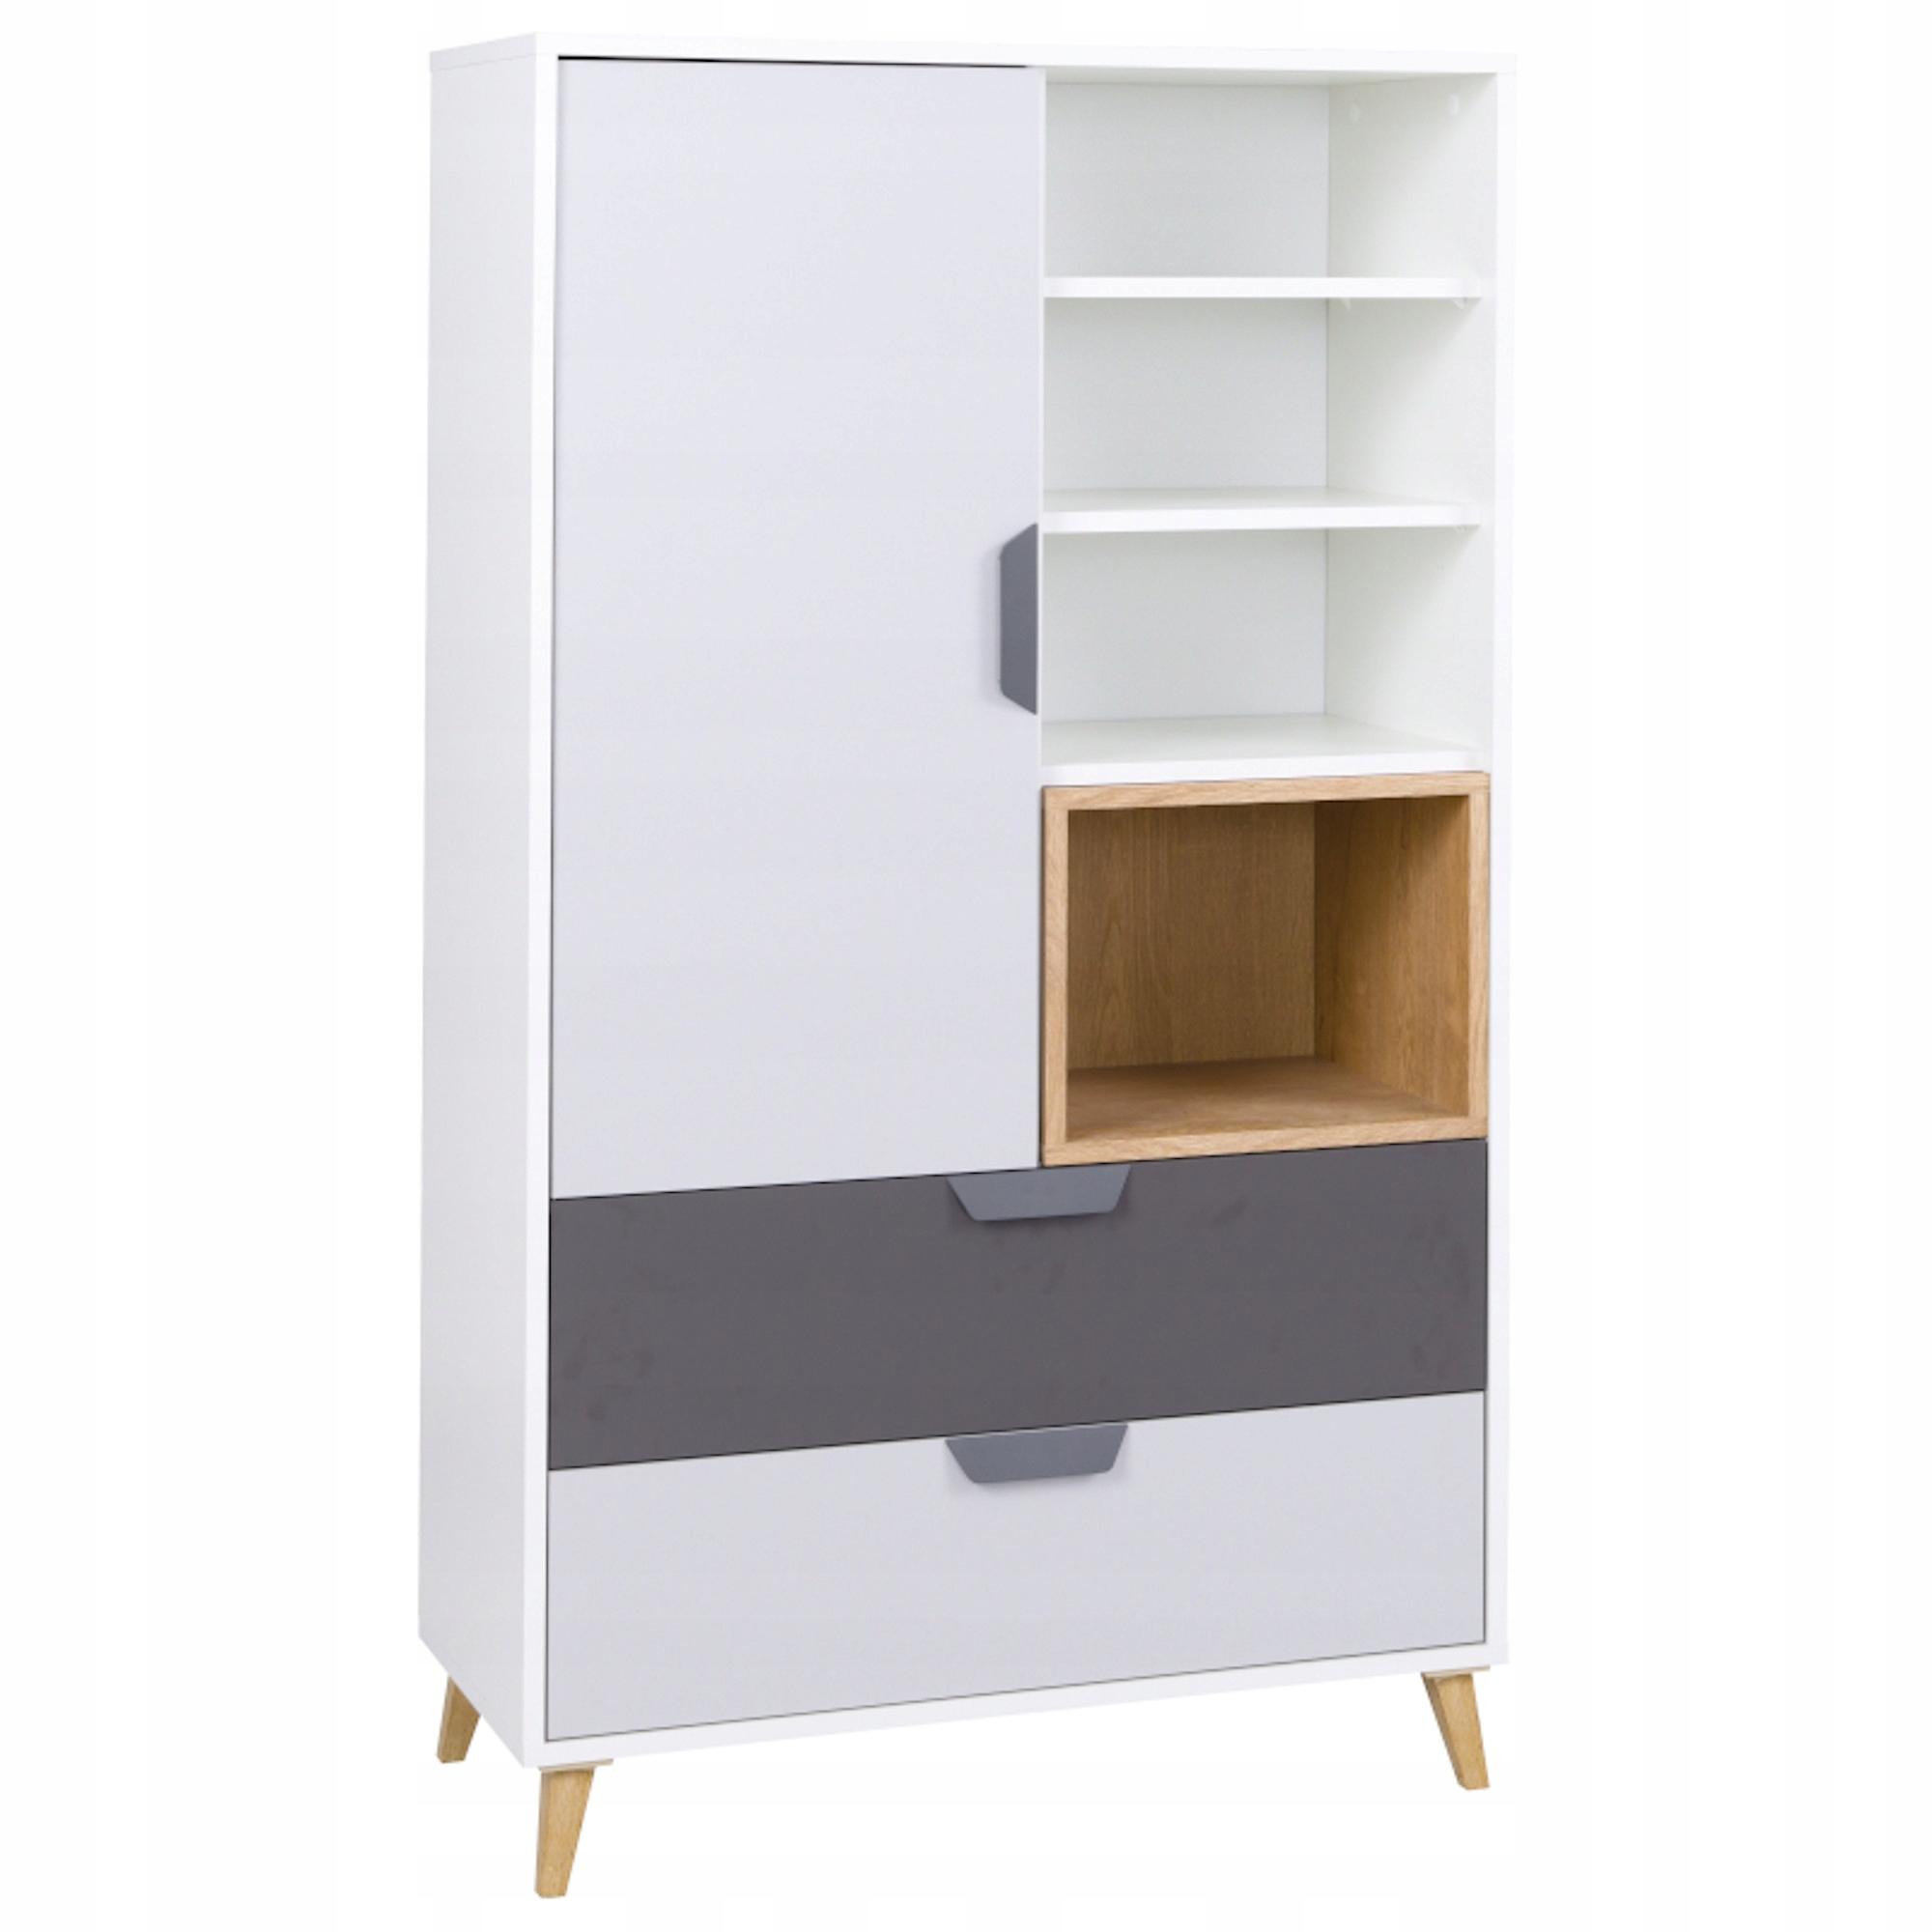 Молодежный книжный шкаф ROOM серый / белый / дуб лефкас